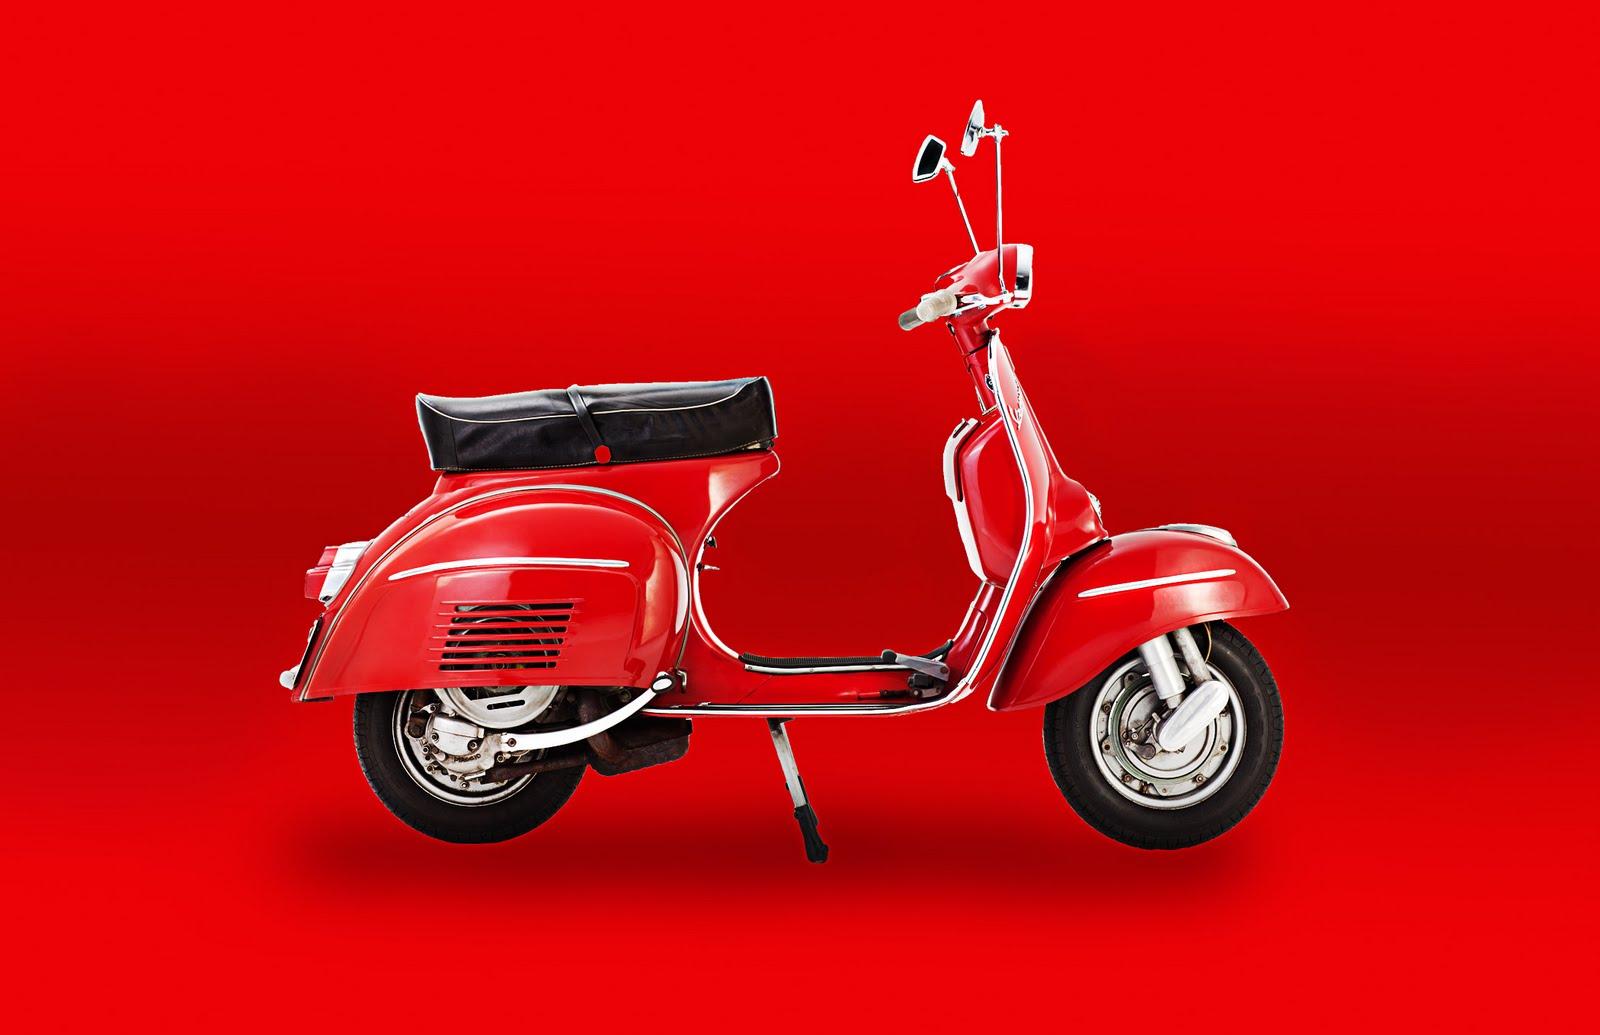 LIFESTYLE VINTAGE LIFESTYLE VINTAGE: GET THE LOOK Red Vespa Red BG